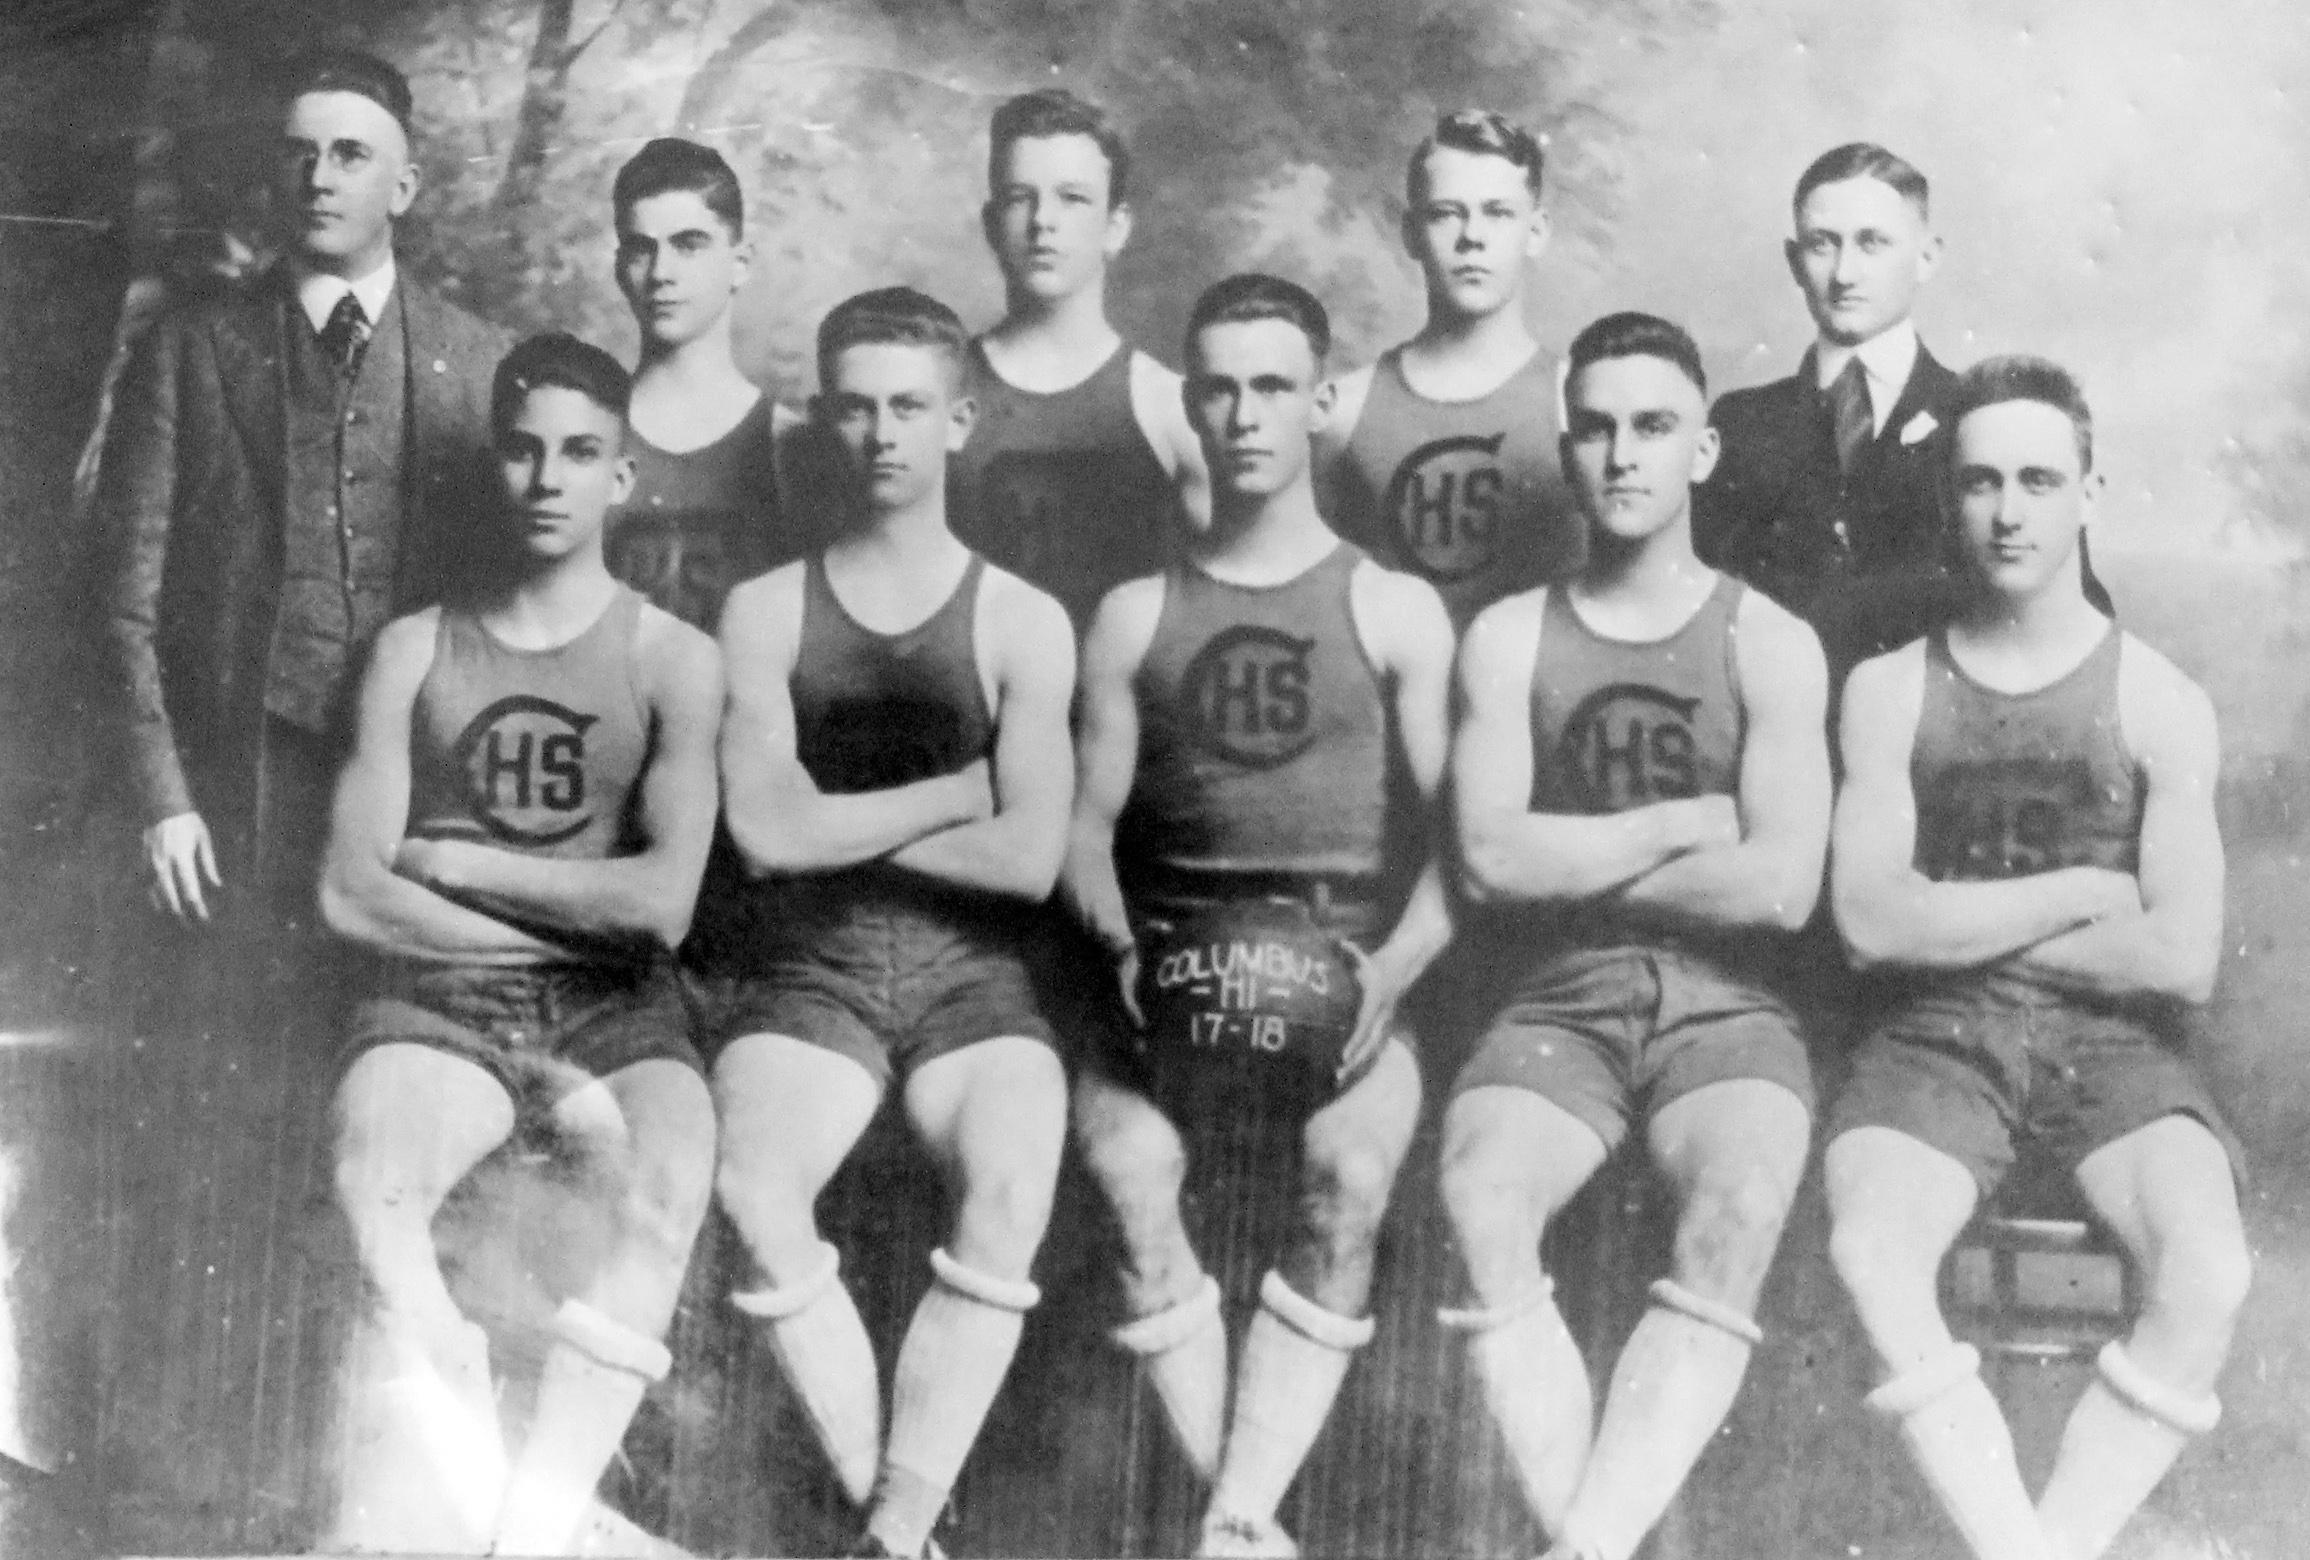 Columbus High 1918 Basketball Champions.  FRONT ROW: Mark Rosenberg, Bunn Martin, Hal Campbell, Kenneth Munn, Jack Key. BACK ROW: Coach D.W. Johnston, Jack Kaufman, Joe Blackmon, William Chambers, and Manager Willie McCraney.